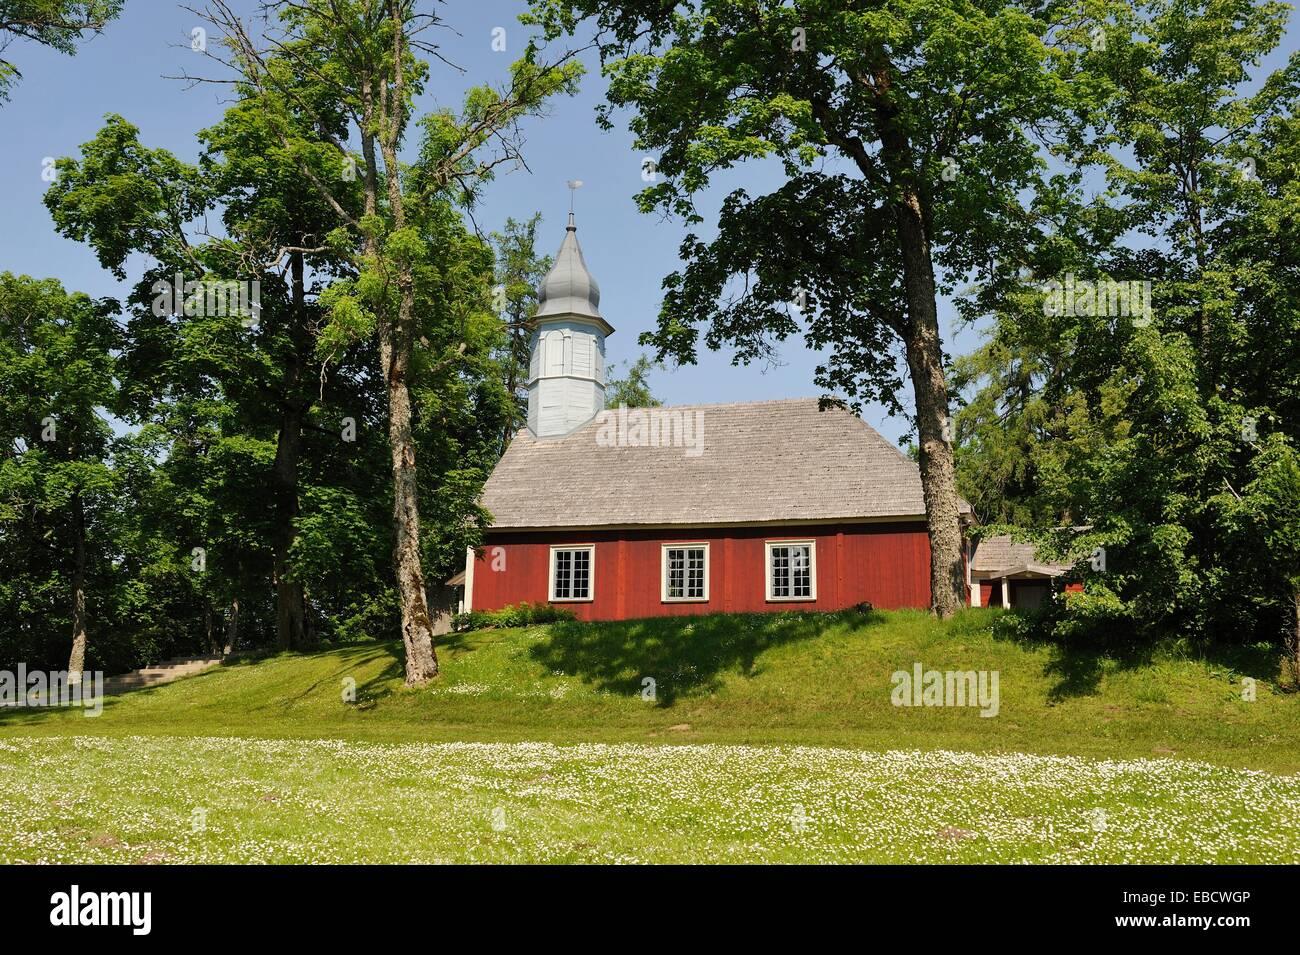 1750 architecture balte Baltic build building church color image E.U. Europe European Union Gauja horizontal Latvia - Stock Image